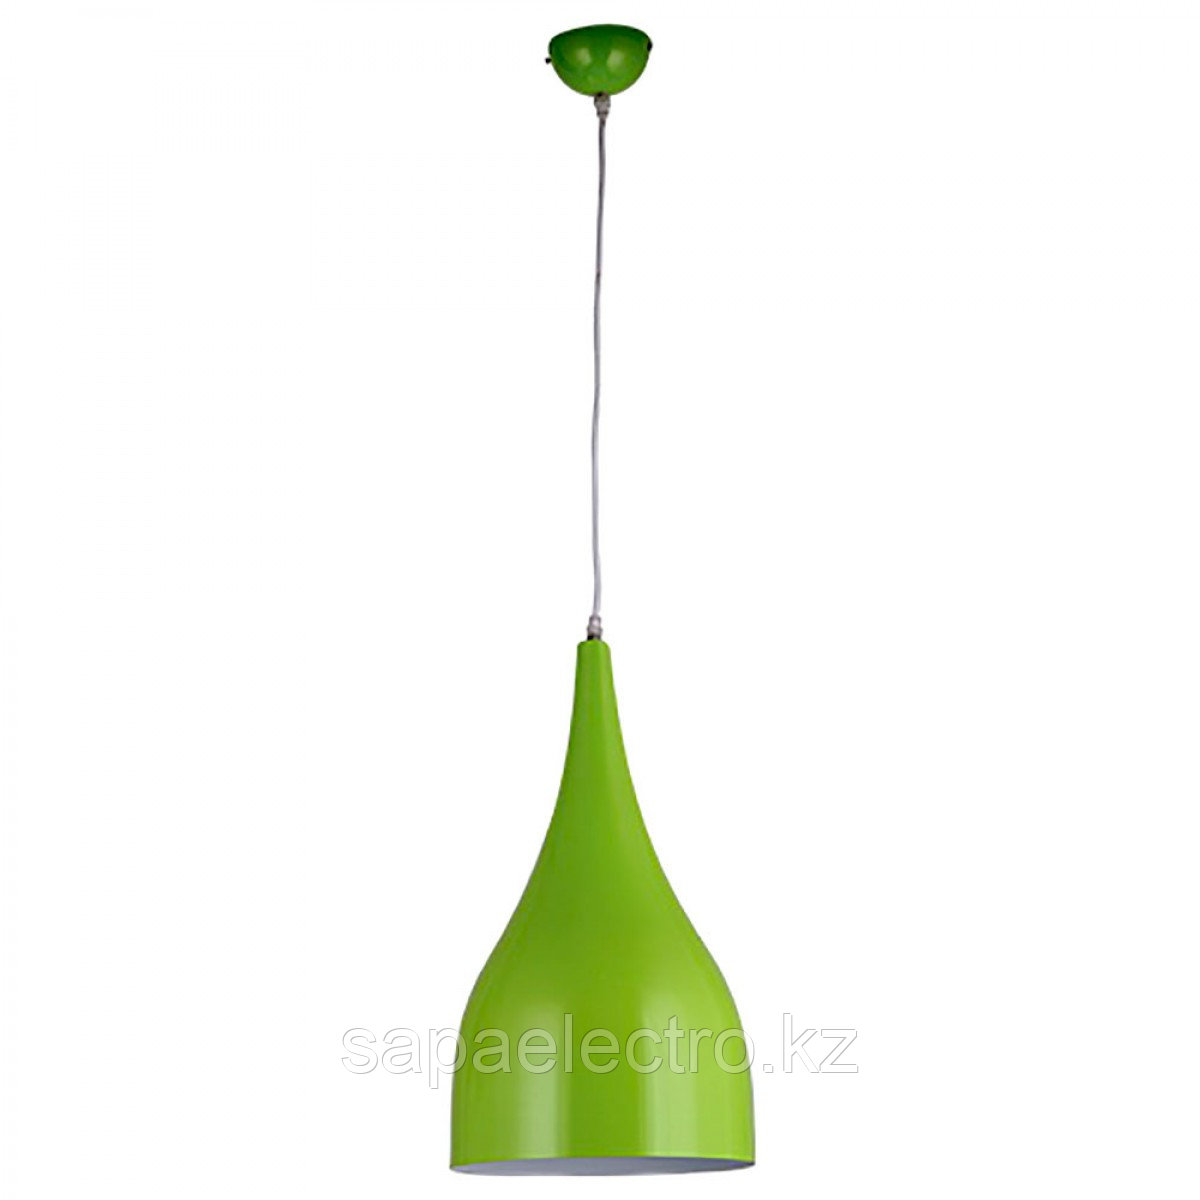 Свет-к MD97549/1 GREEN E27 100W (TEKSAN) 2шт